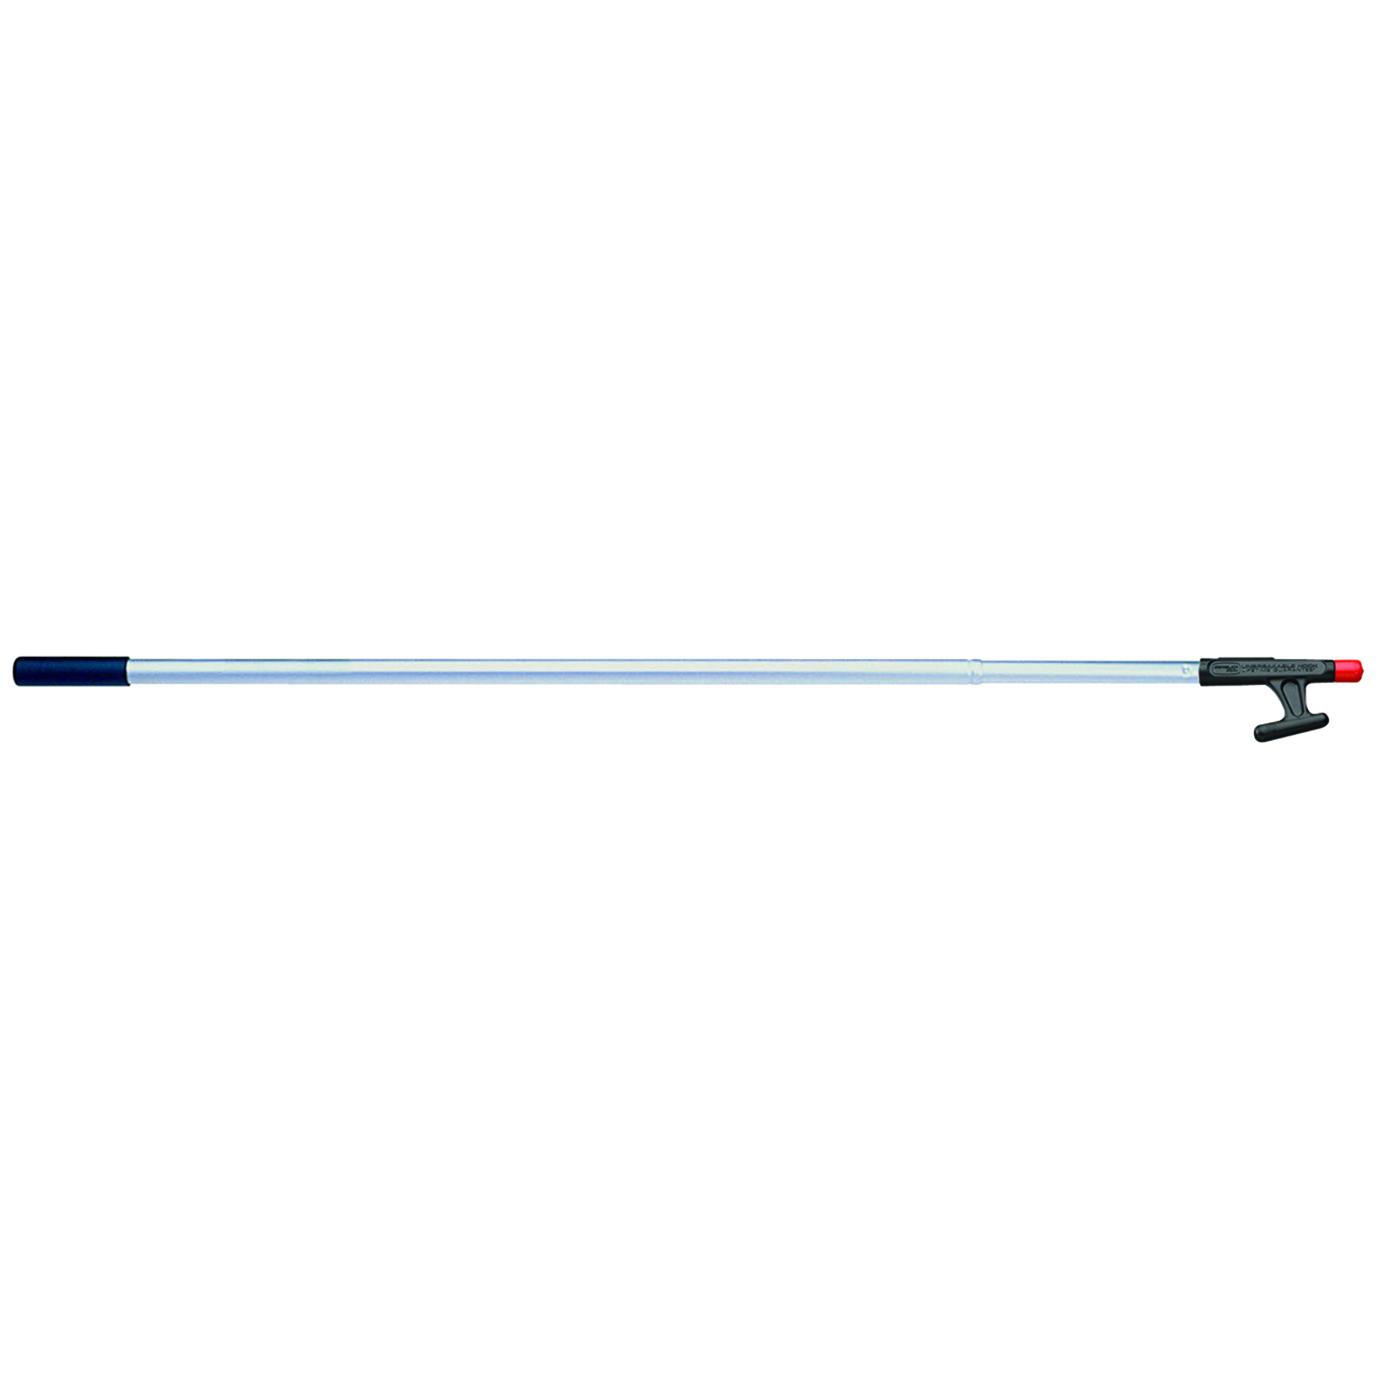 Sea-Dog Aluminum Boat Hook 8/' 2-Piece #491024-1